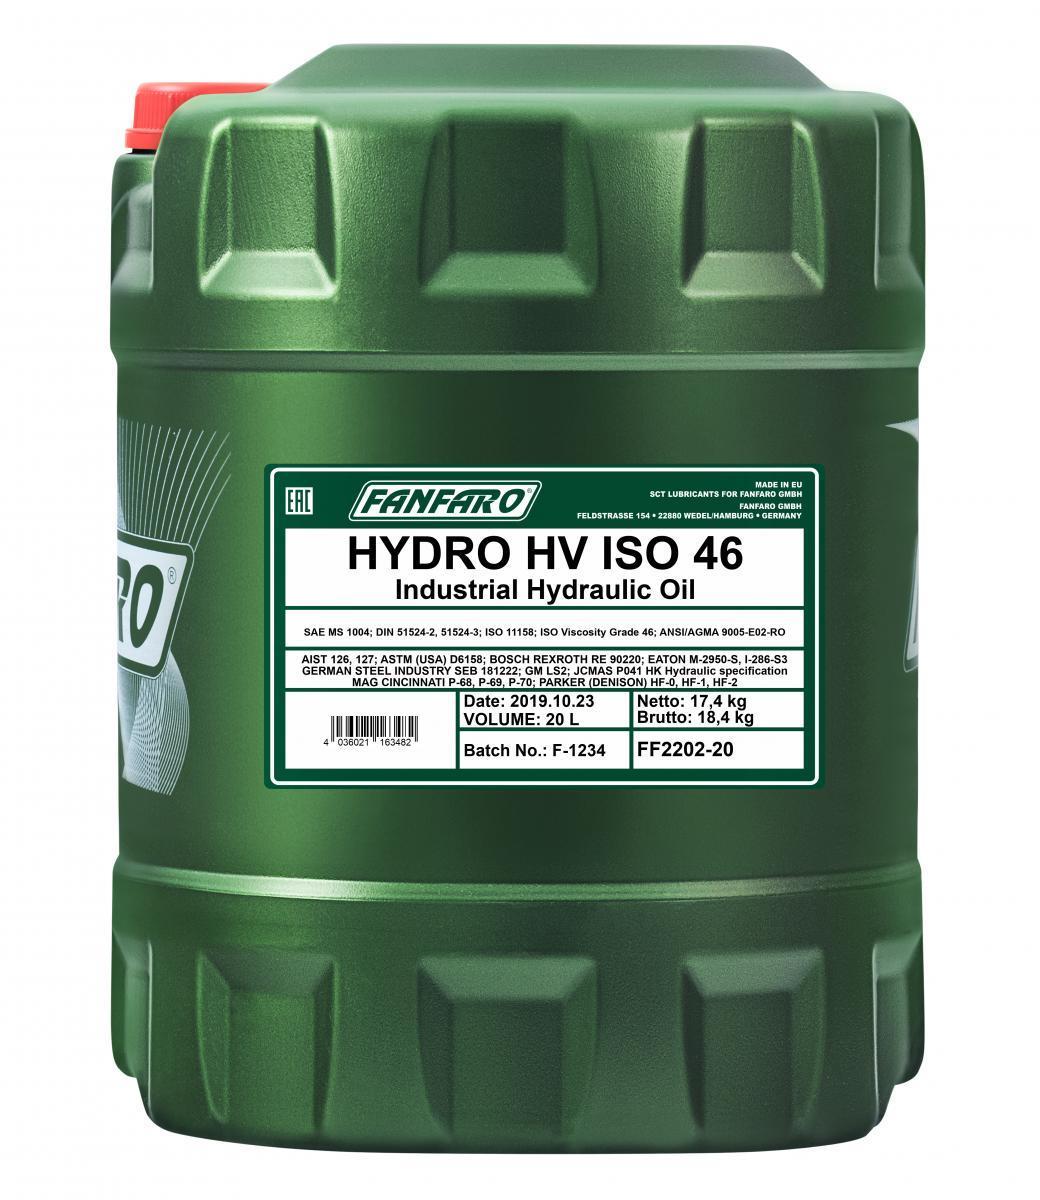 LKW Hydrauliköl FANFARO FF2202-20 kaufen